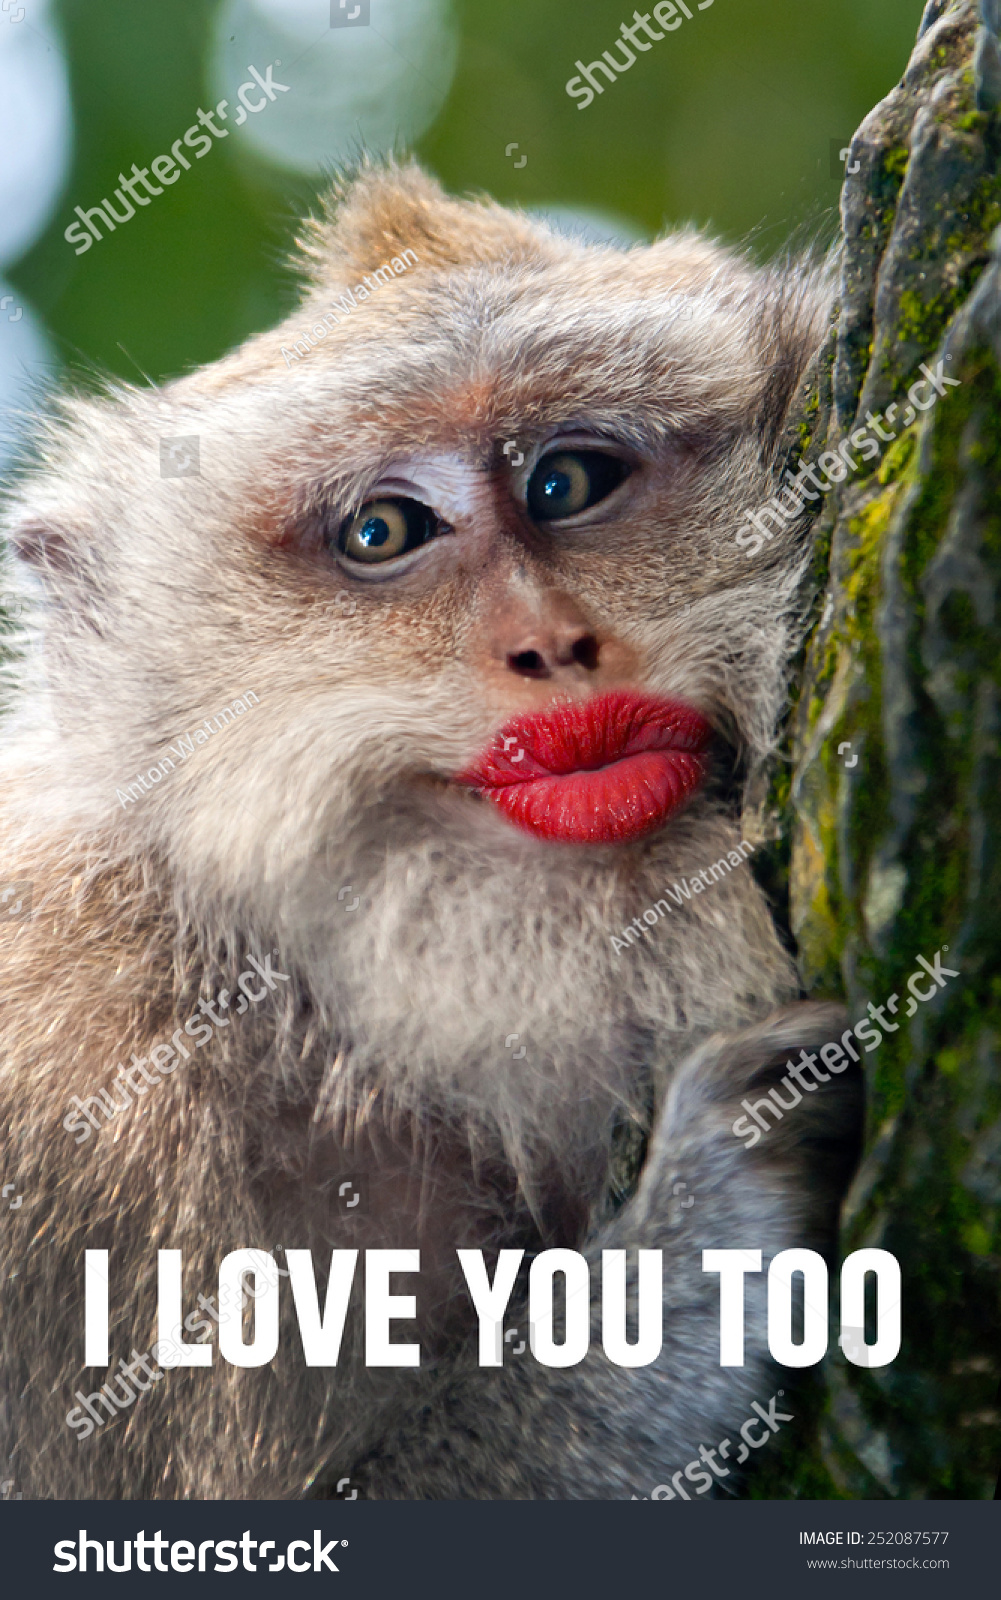 Love monkey dating